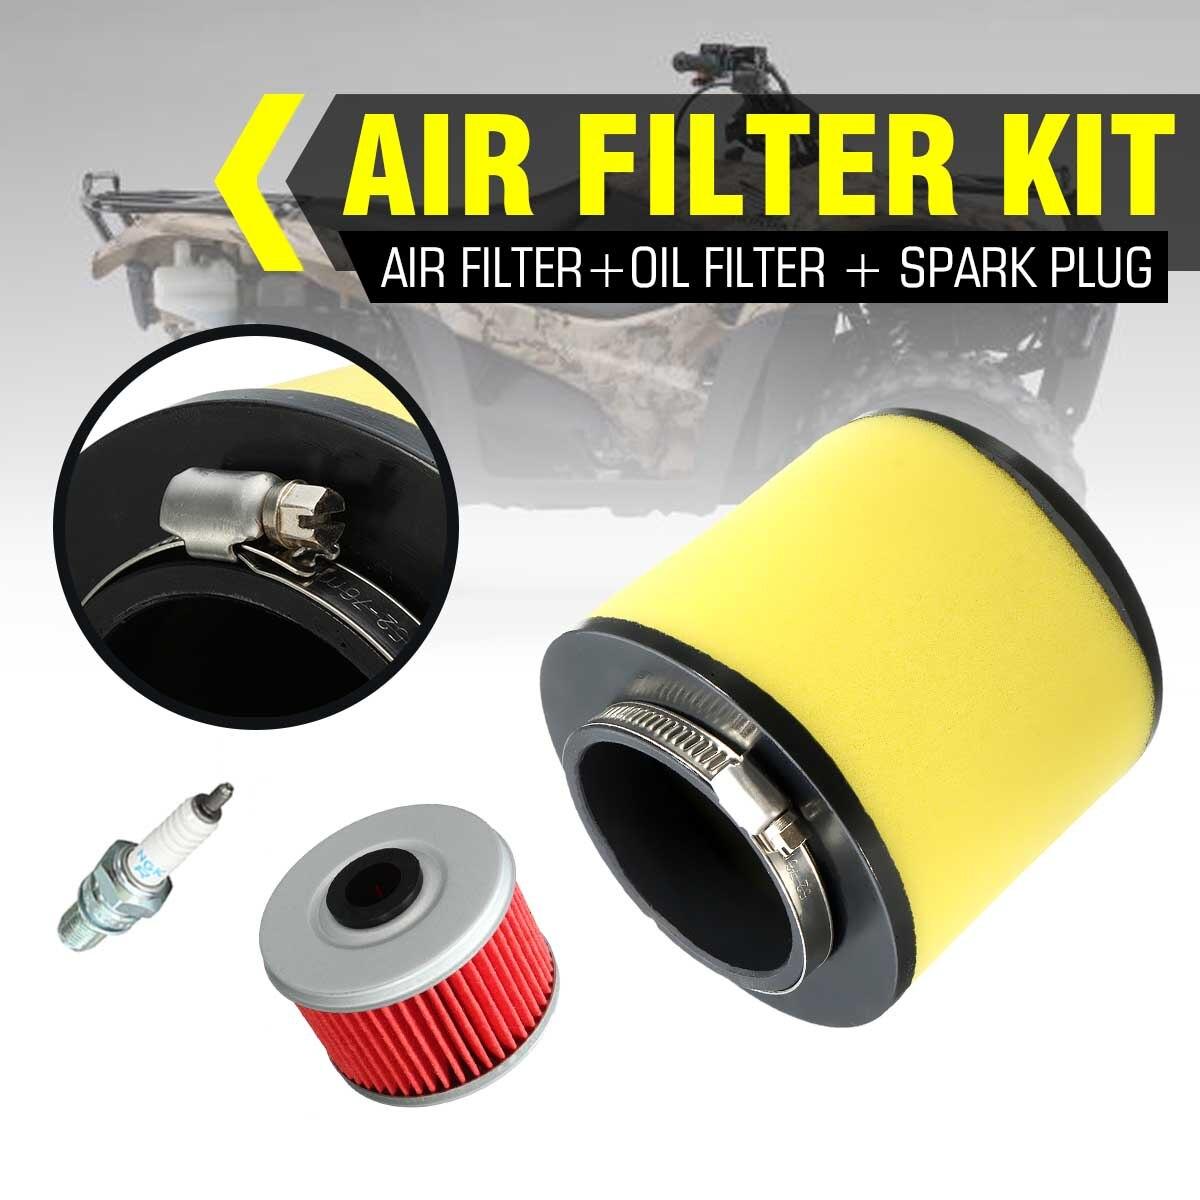 Air Oil Filter Spark Plug 17254-HC5-900 For Honda FourTrax 300 TRX300 TRX300FW